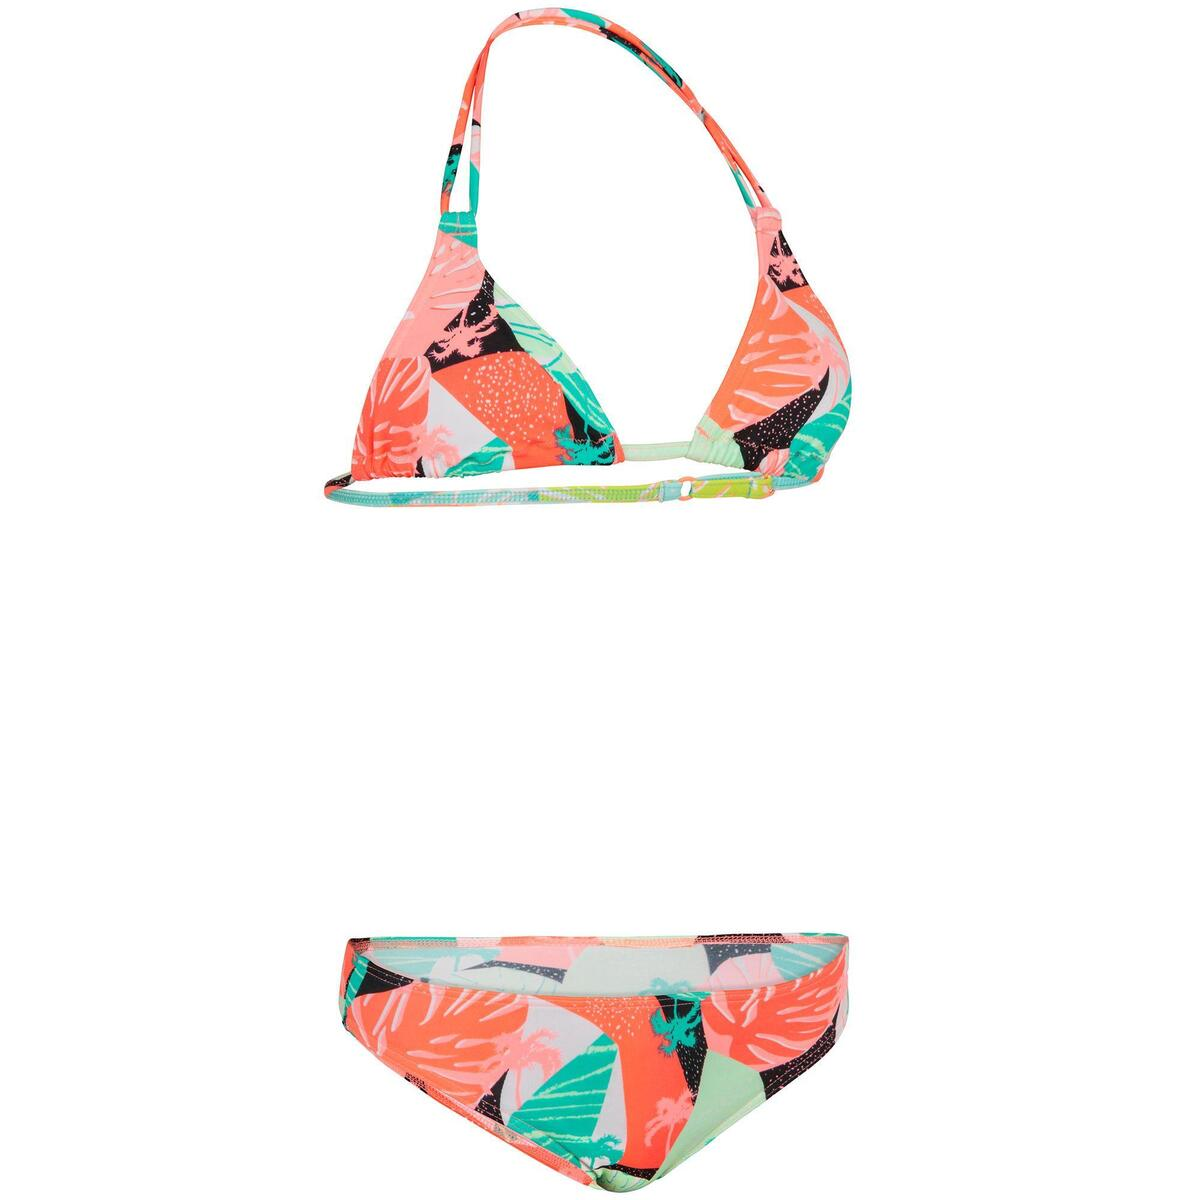 Bild 2 von Bikini-Set Triangel Taloo Lilou Origami Surfen Mädchen neon-rosa